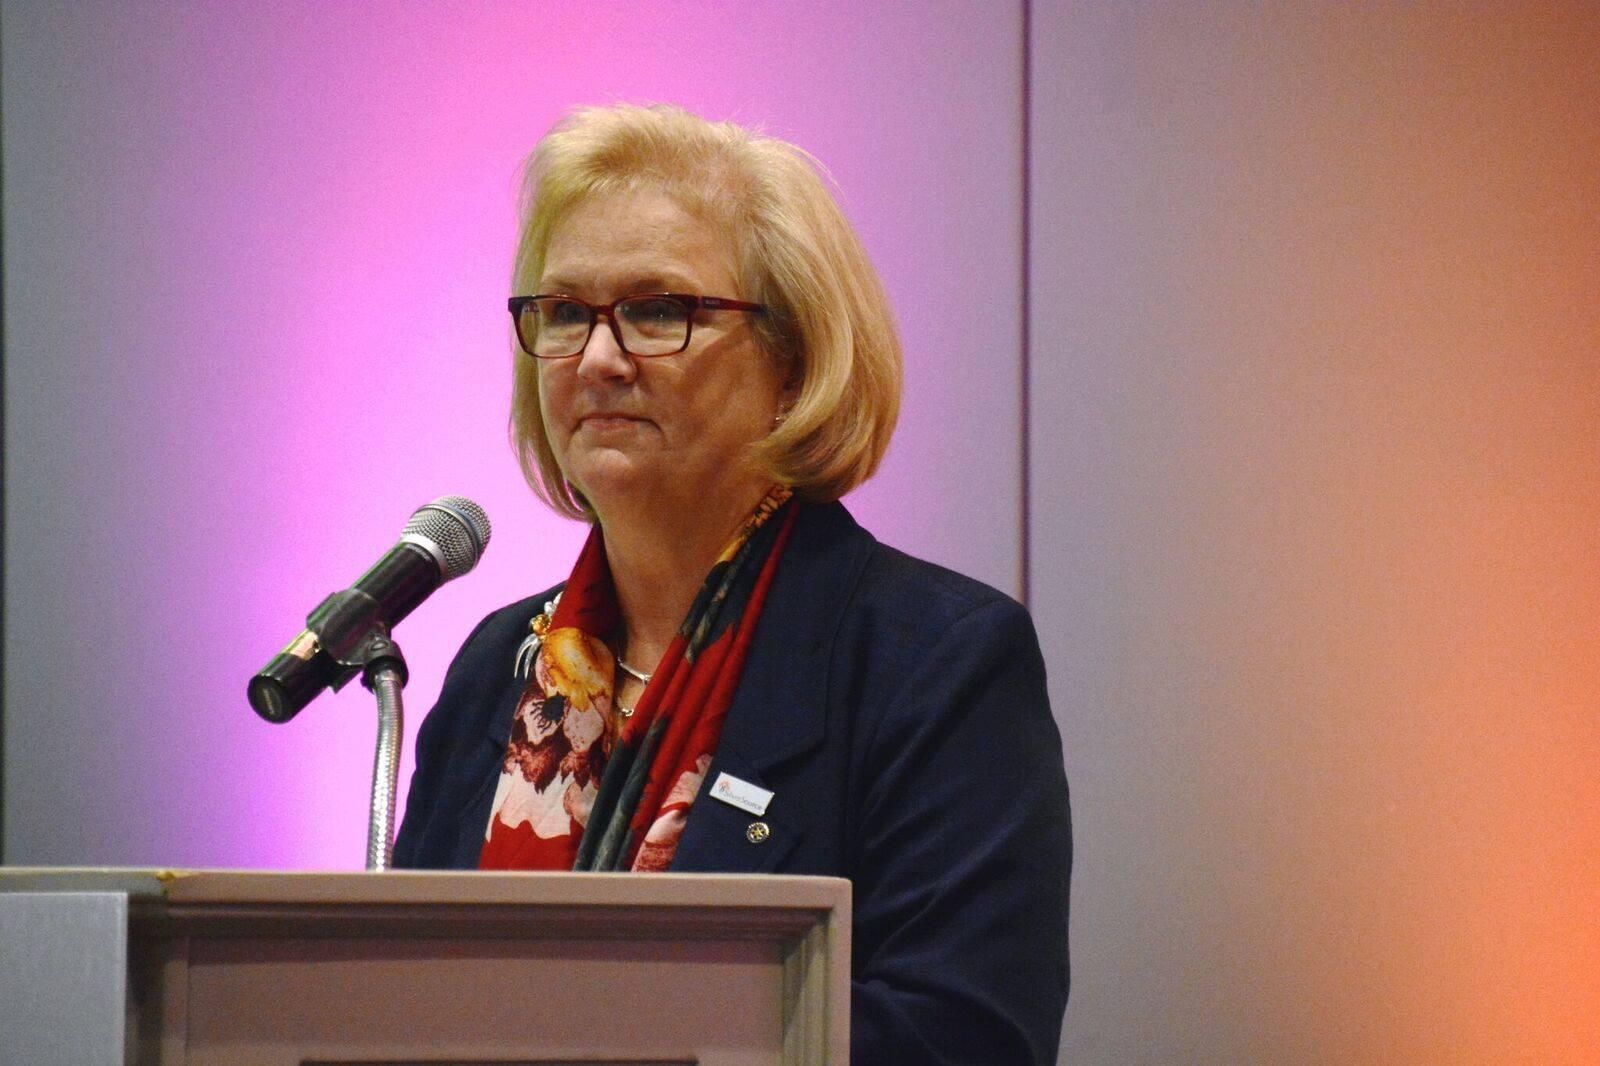 12A-Kathleen B. at podium